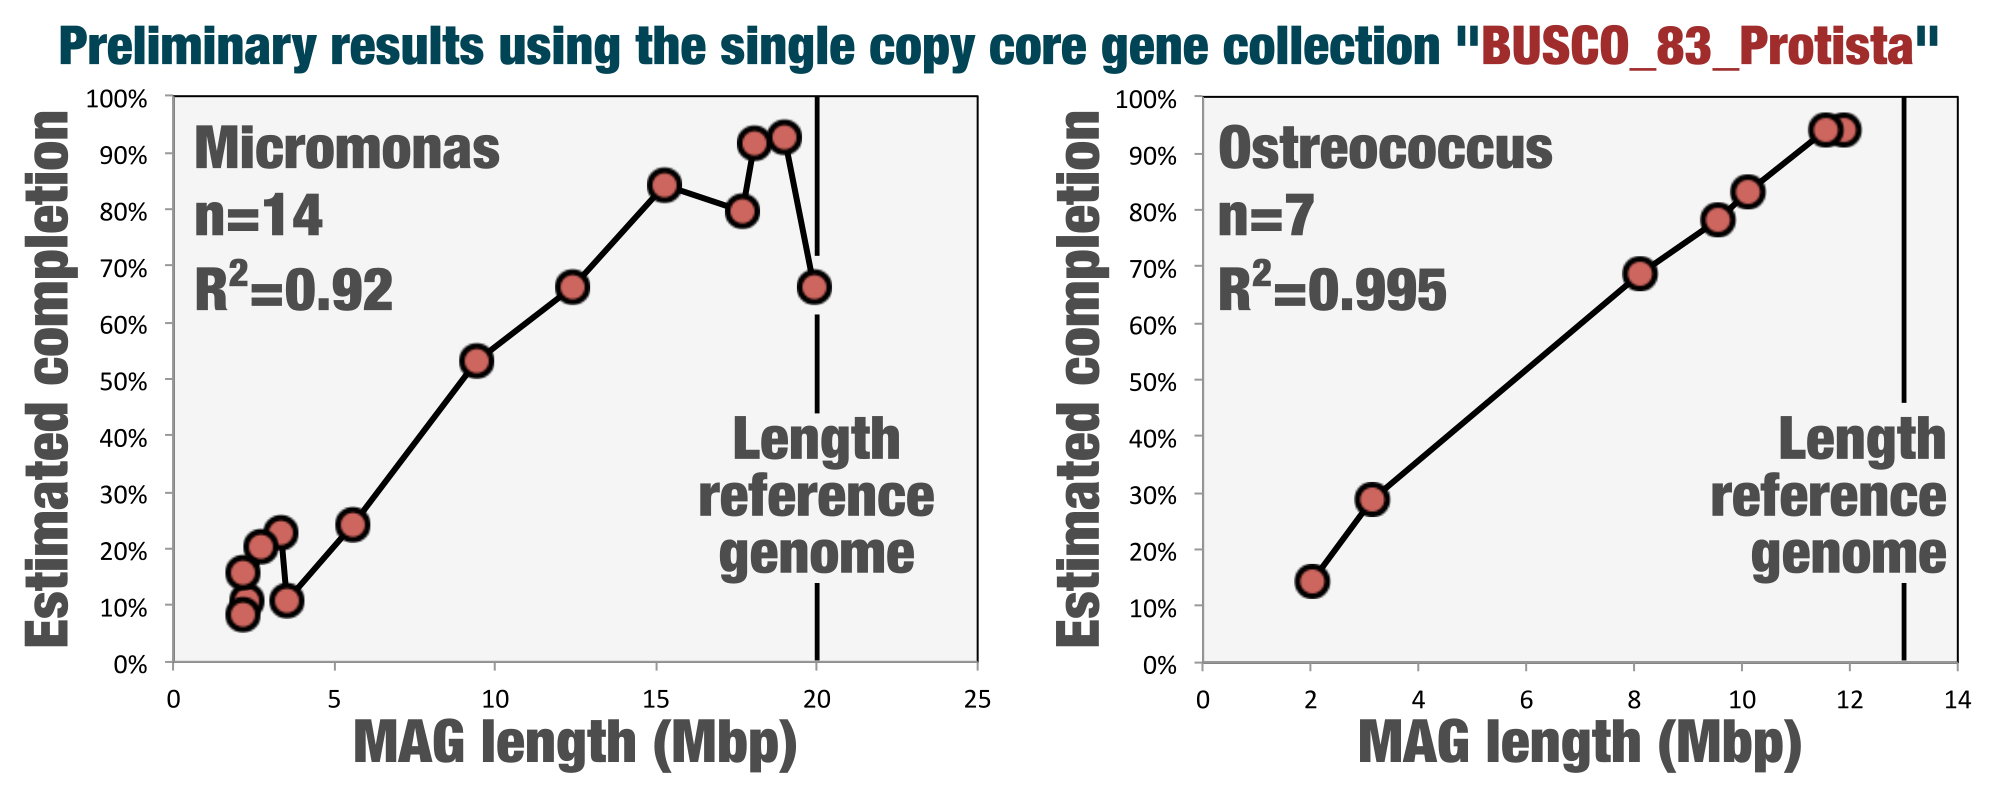 http://merenlab.org/images/anvio/2018-05-05-eukaryotic-single-copy-core-genes/correlation.png